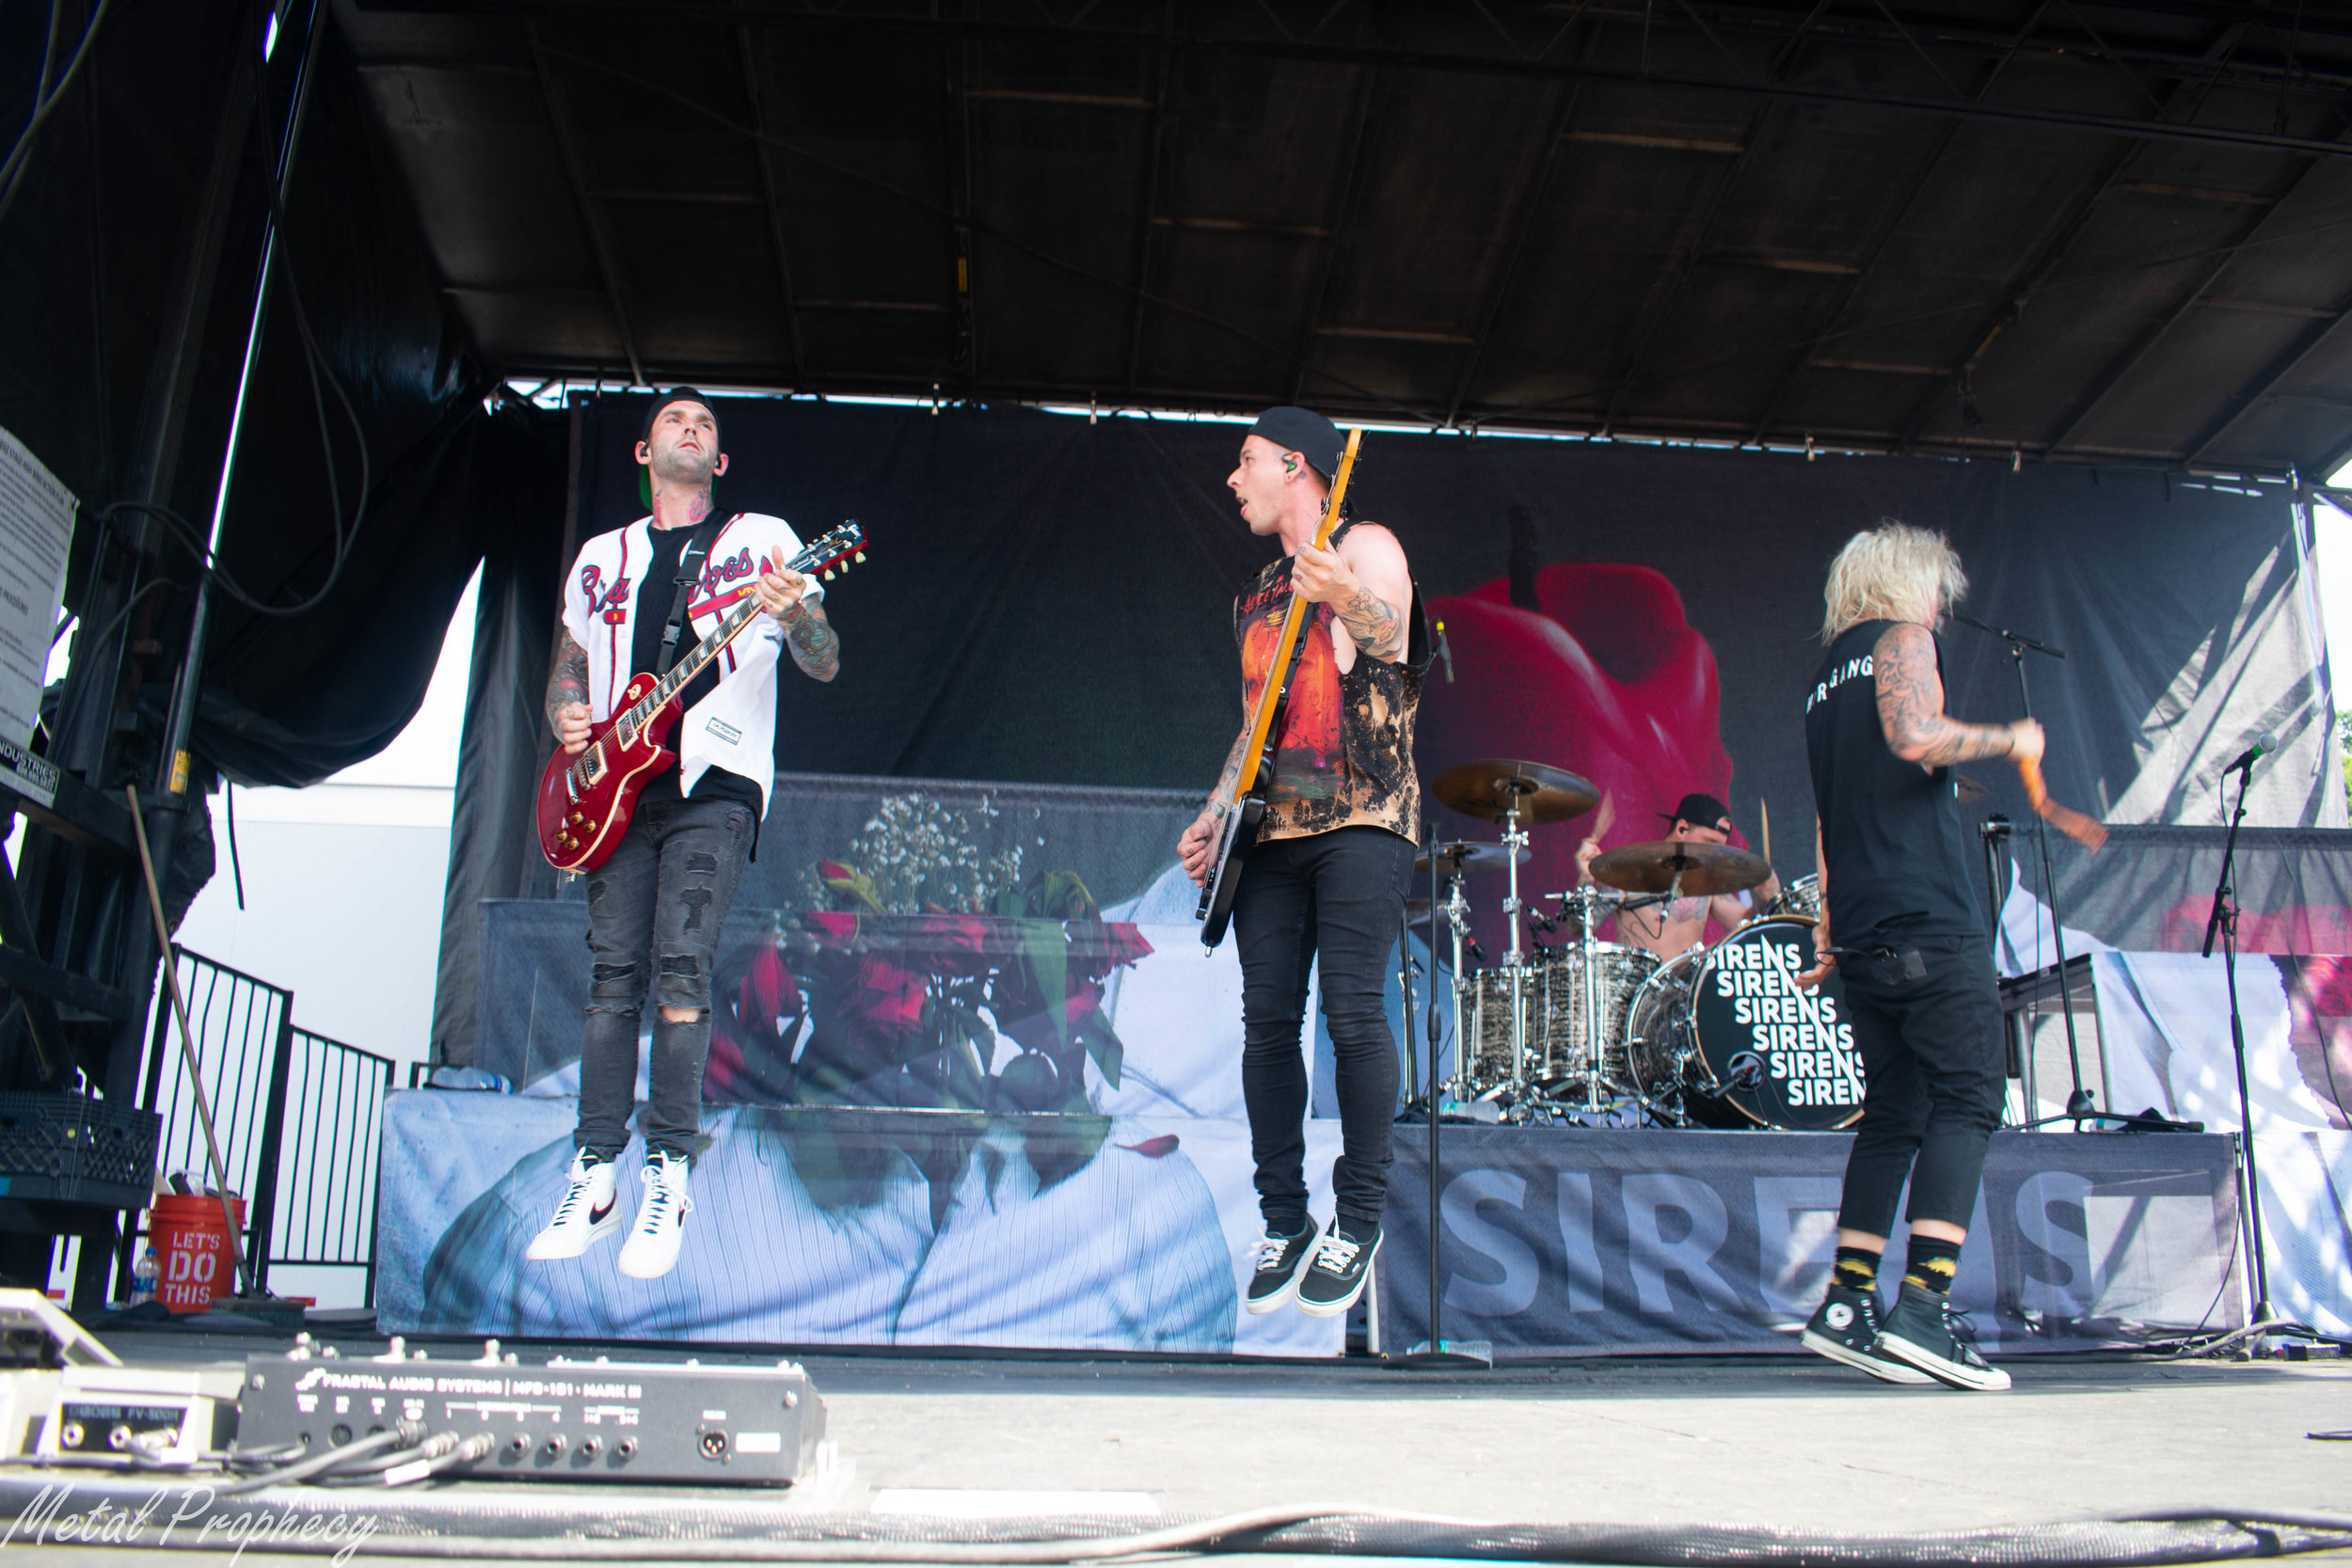 Sleeping With Sirens at Rockstar Disrupt Festival